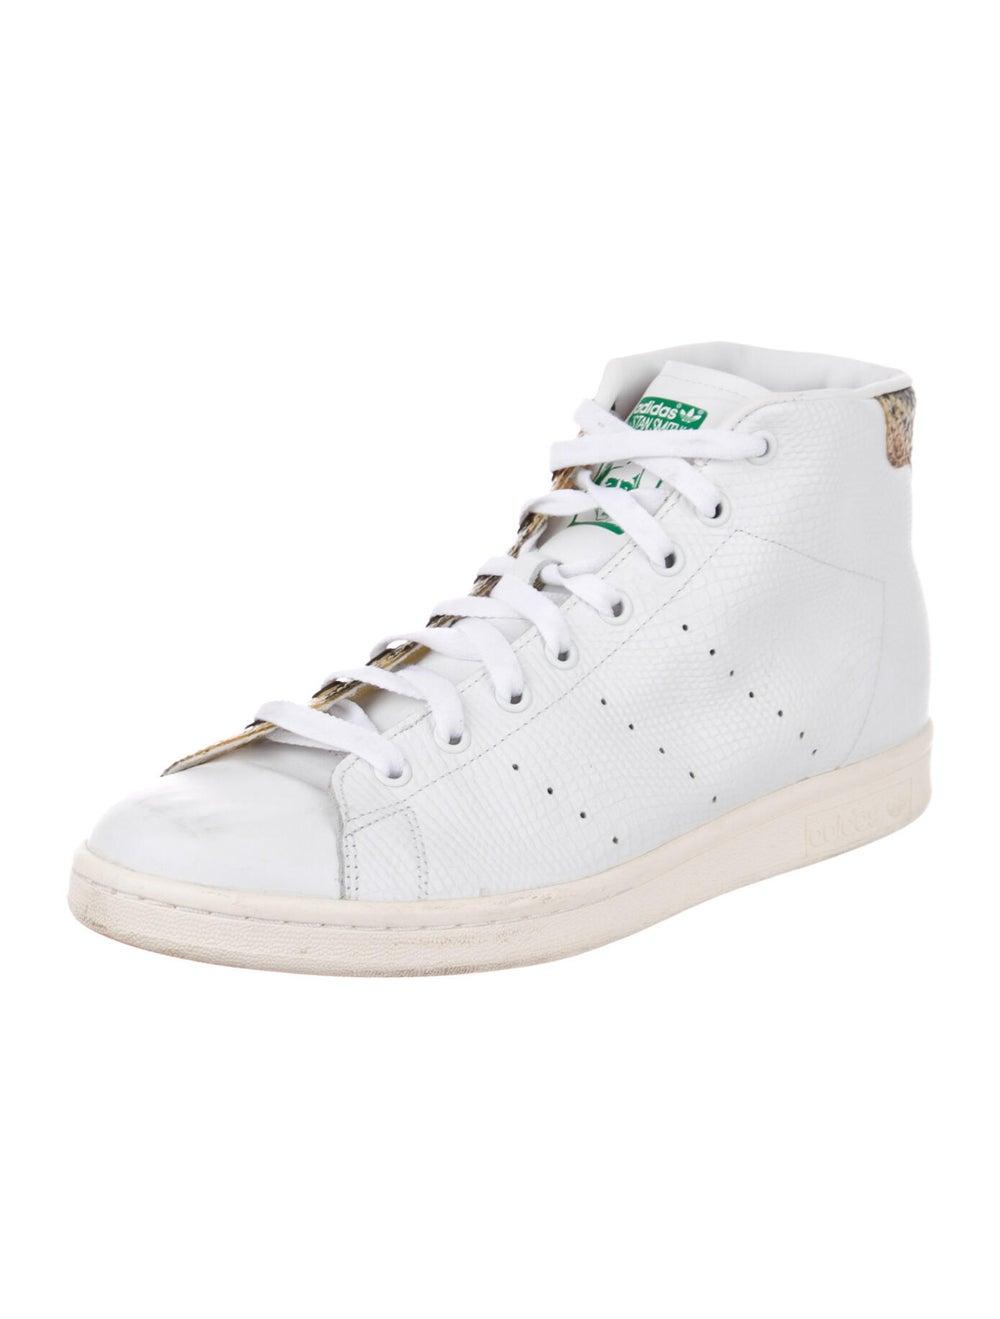 Adidas Stan Smith Mid Sneakers White - image 2